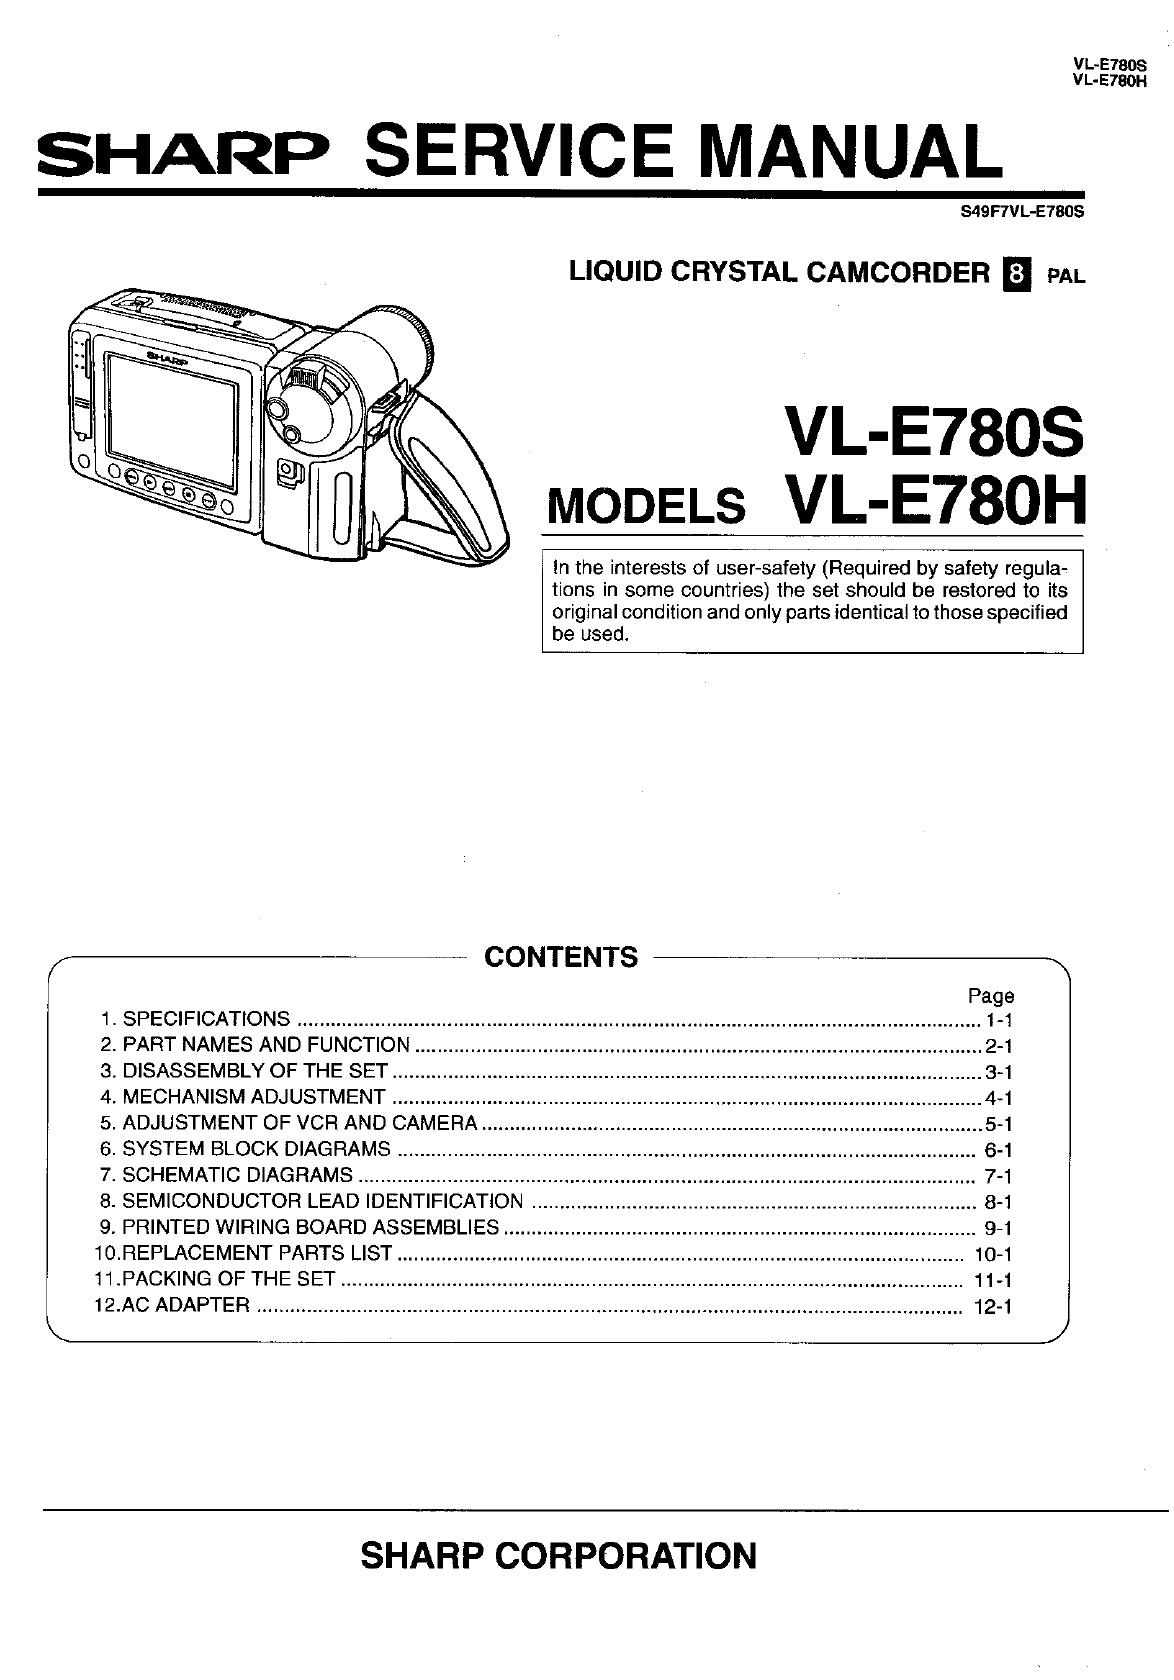 Vle780 Pal Decoder Block Diagram